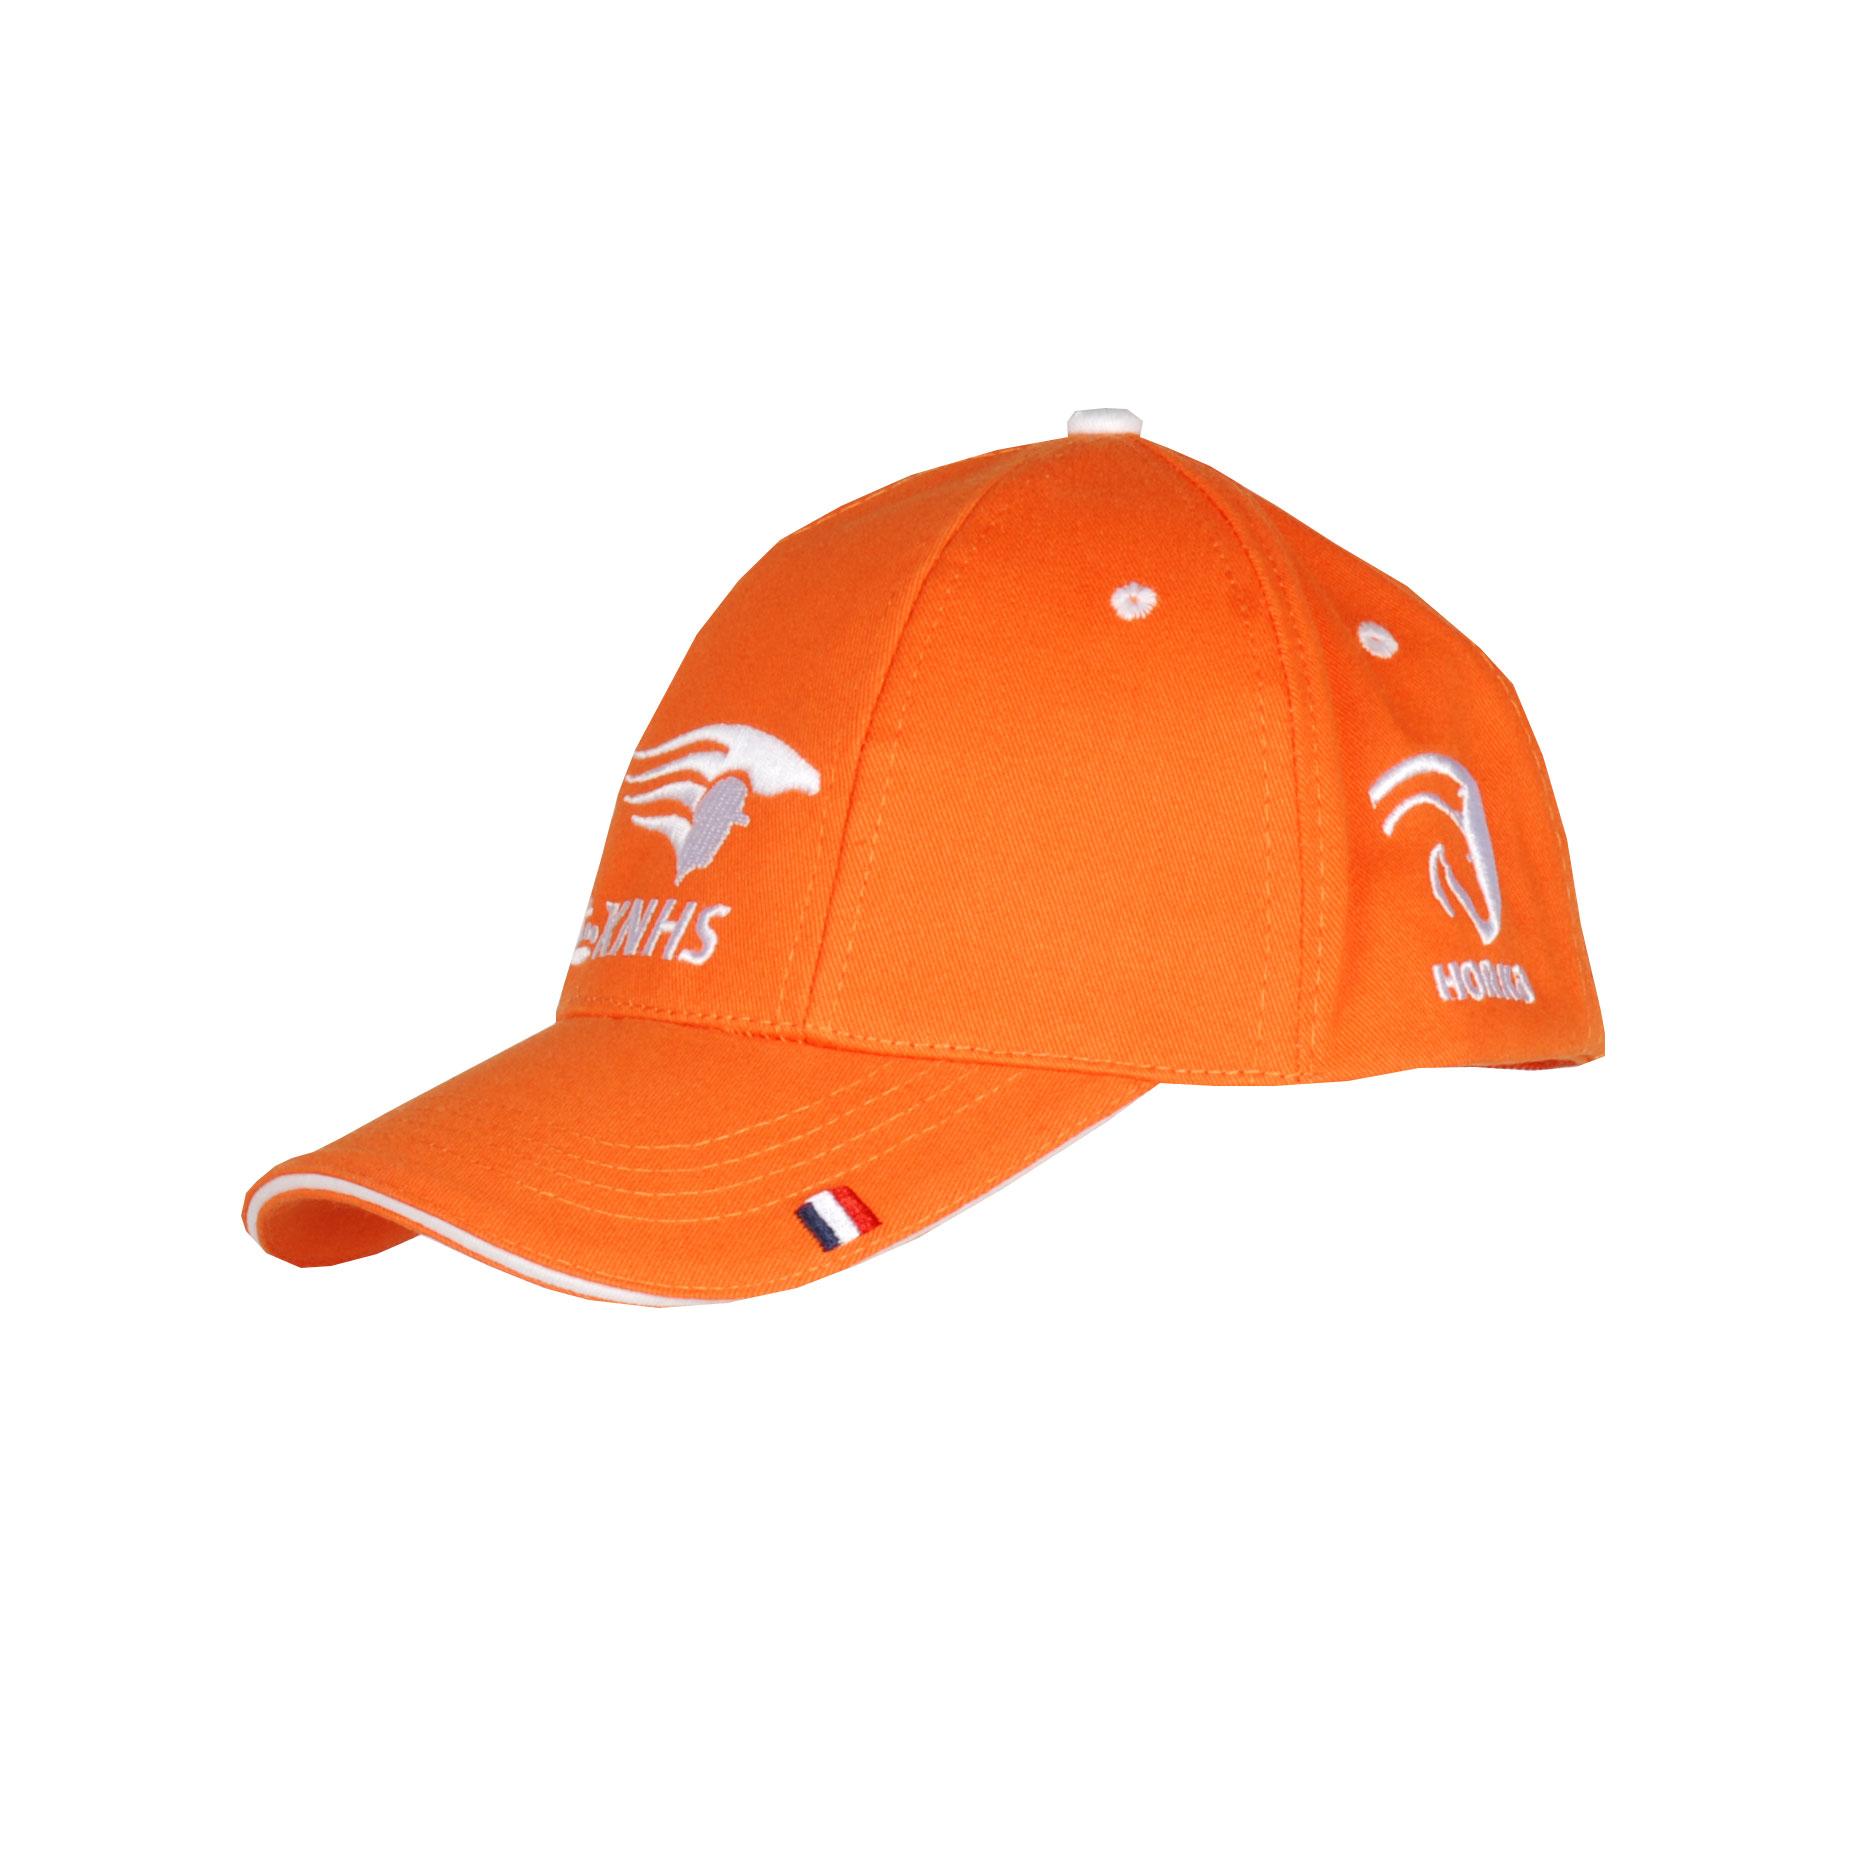 KNHS Fan cap oranje maat:s